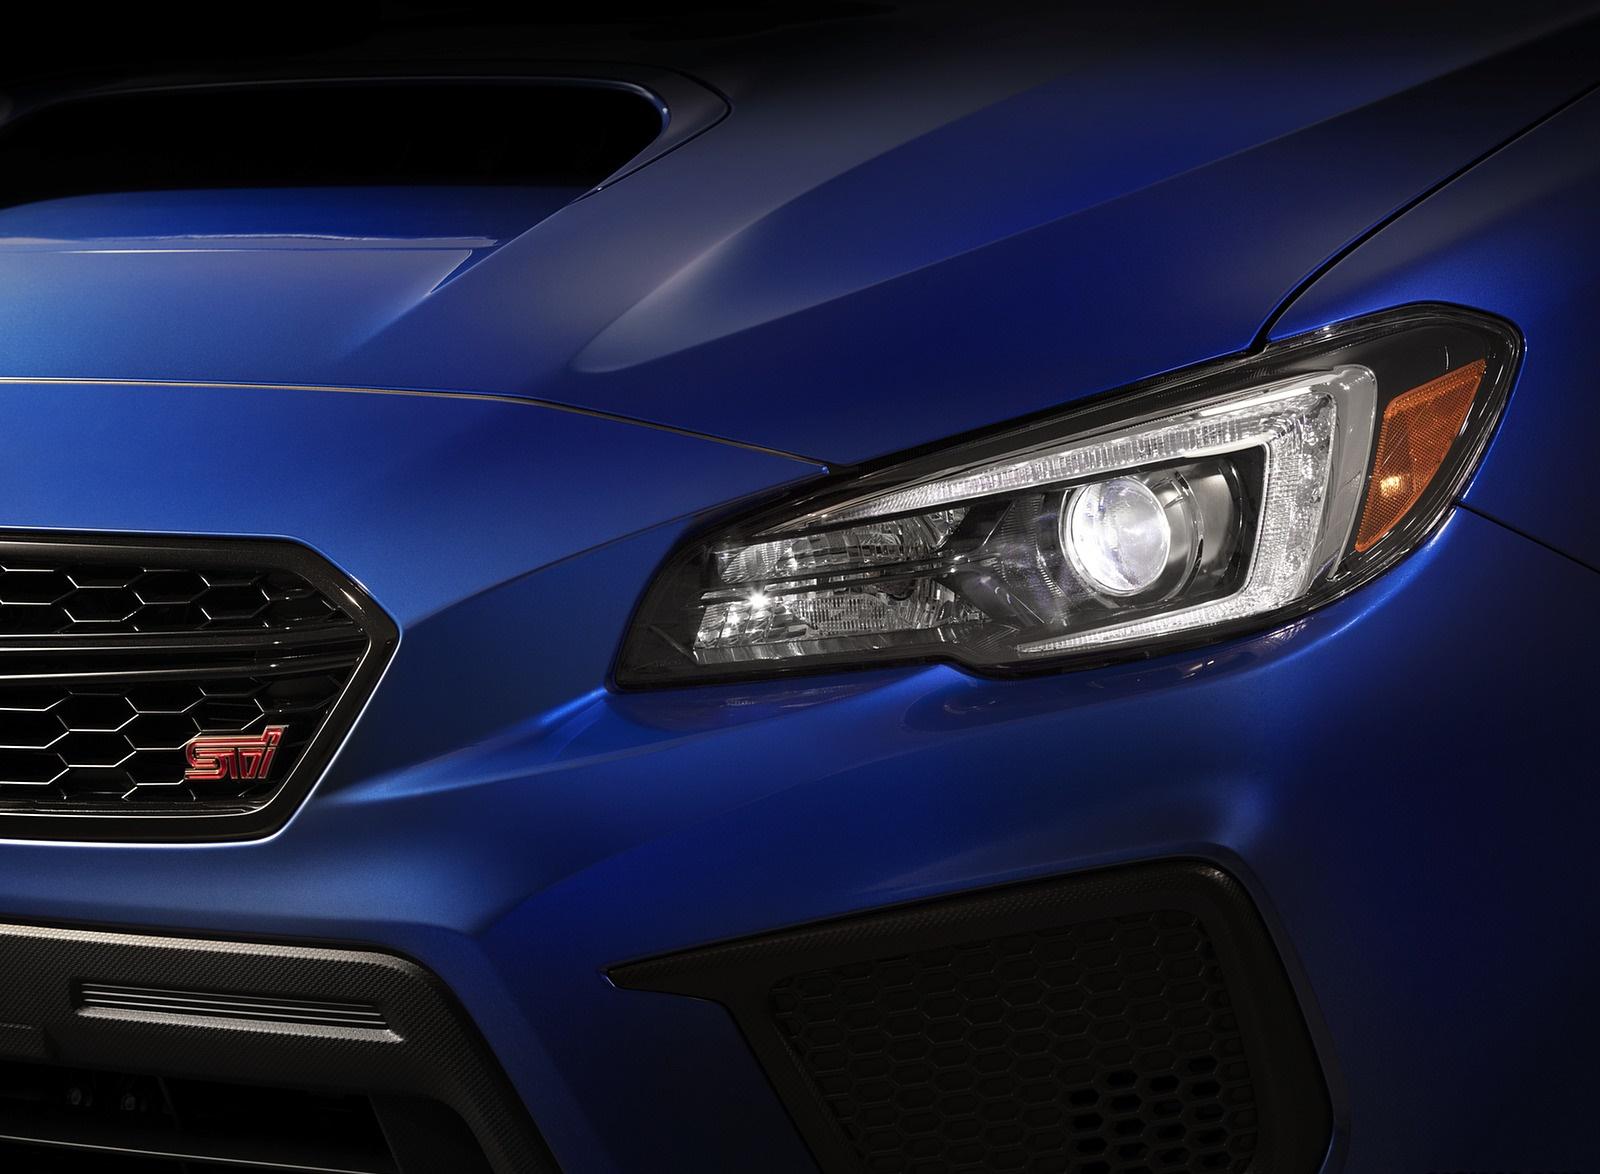 2018 Subaru WRX STI Headlight Wallpapers (9)